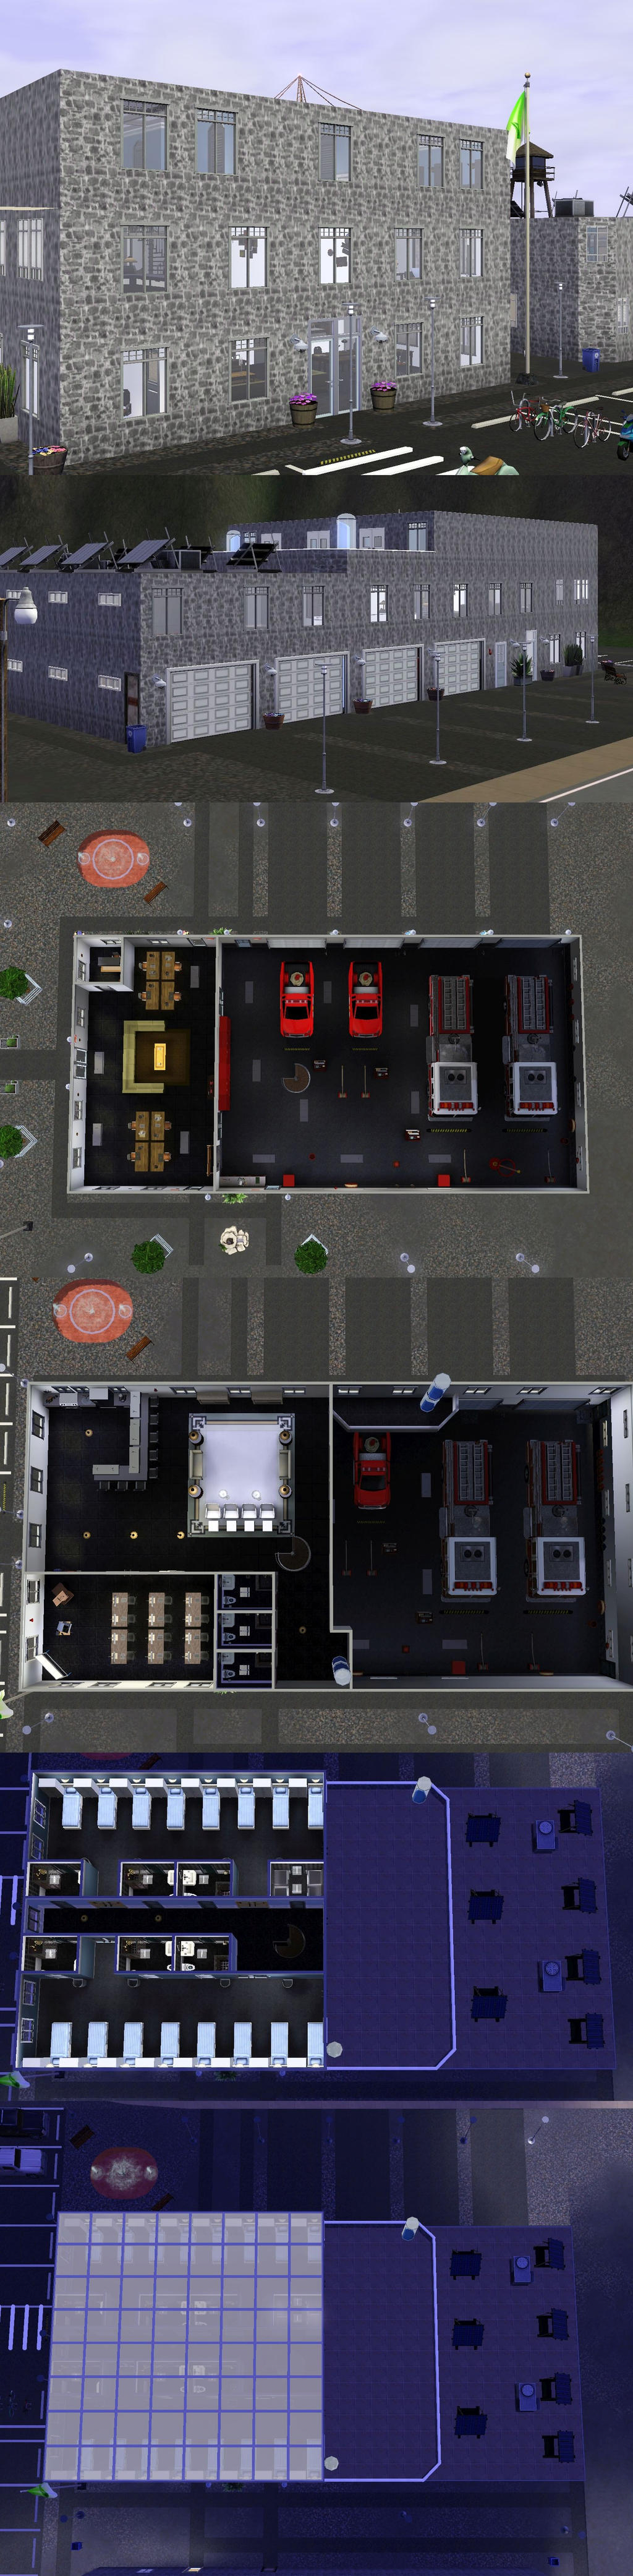 DESMC: Fire Brigade Station by PrlUnicorn